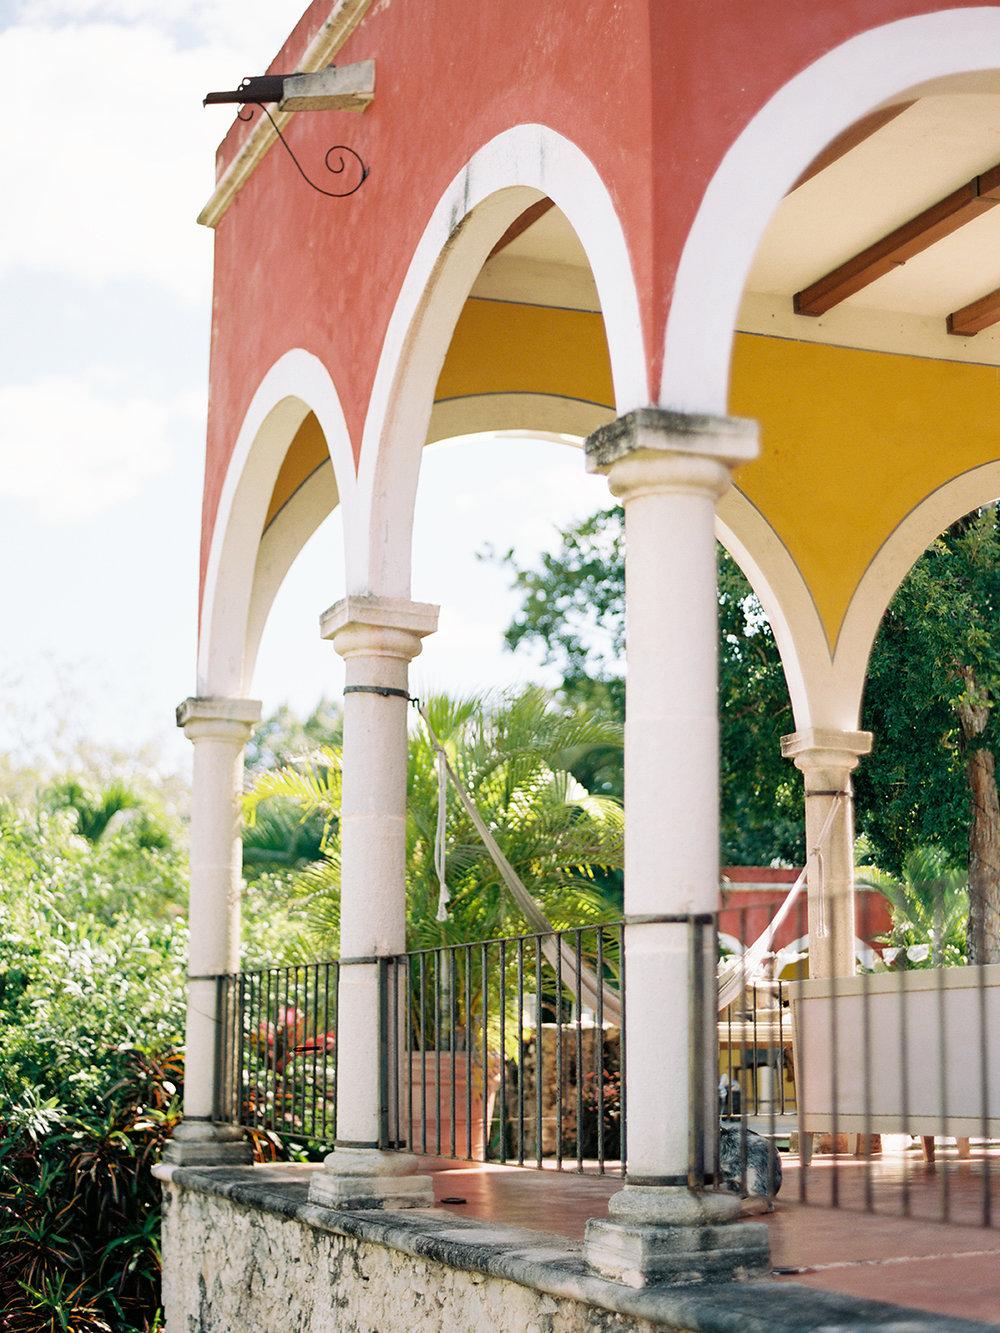 275_Dany+Sarah_Merida_Mexico_Wedding_Brumley & Wells_Fine_art_film_photography.jpg